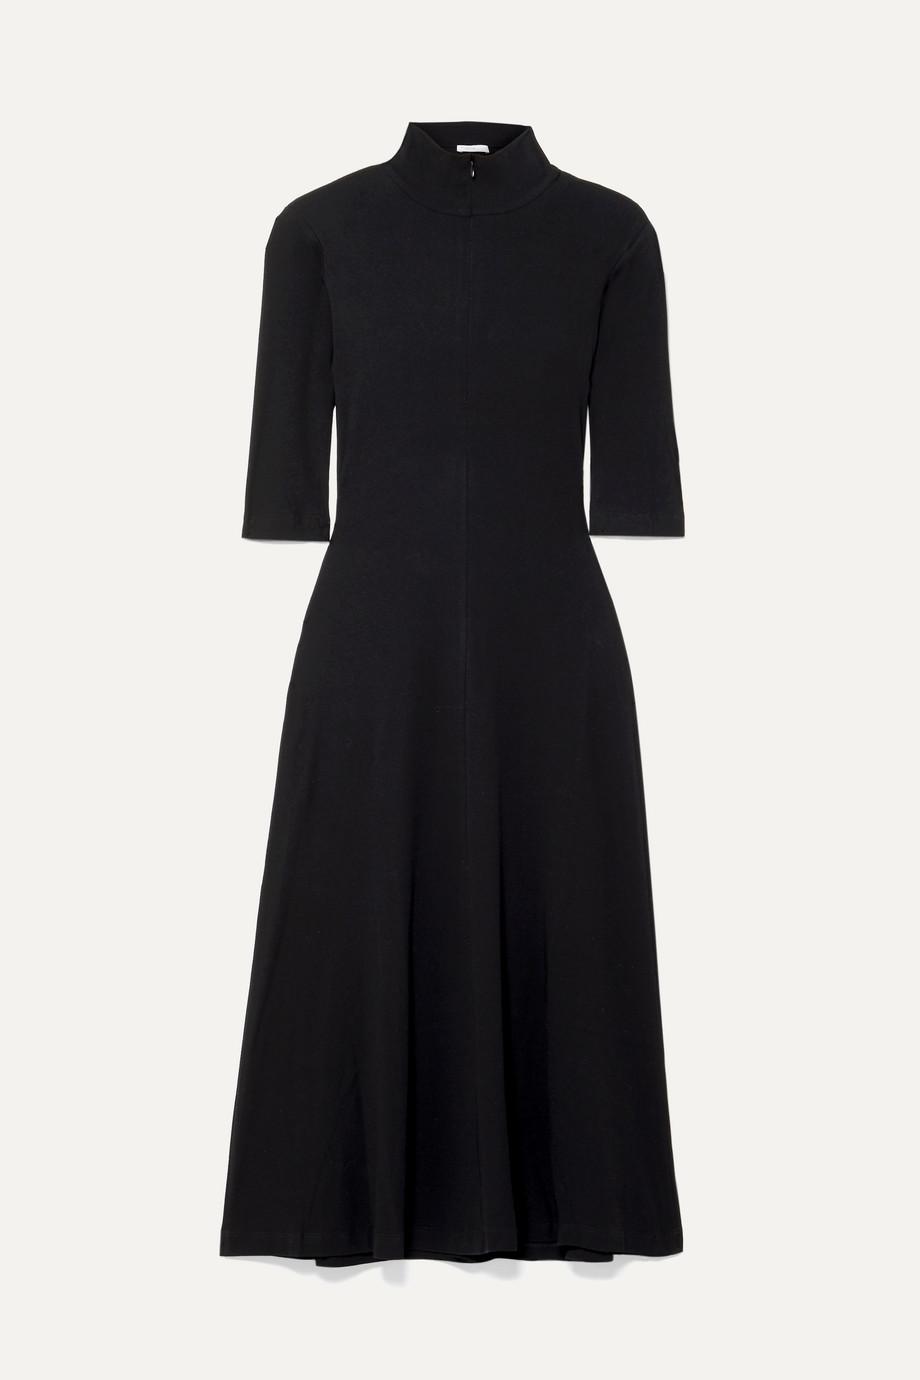 Rosetta Getty Stretch-cotton jersey turtleneck dress